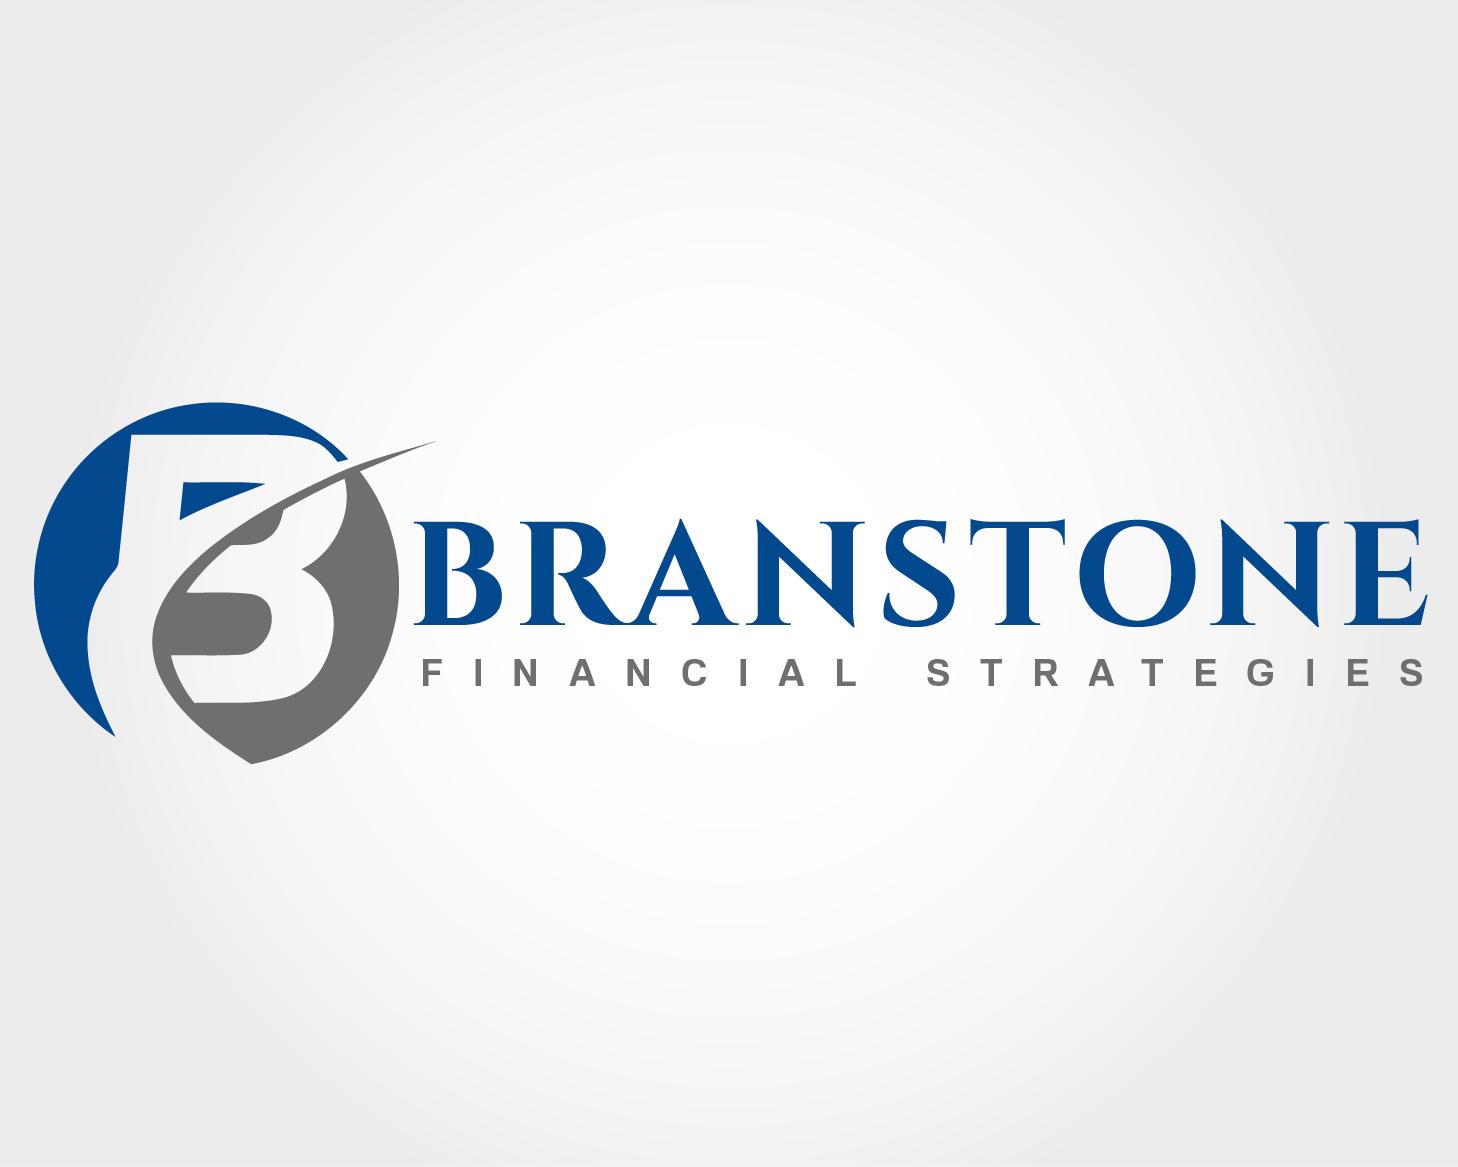 Logo Design by VENTSISLAV KOVACHEV - Entry No. 346 in the Logo Design Contest Inspiring Logo Design for Branstone Financial Strategies.